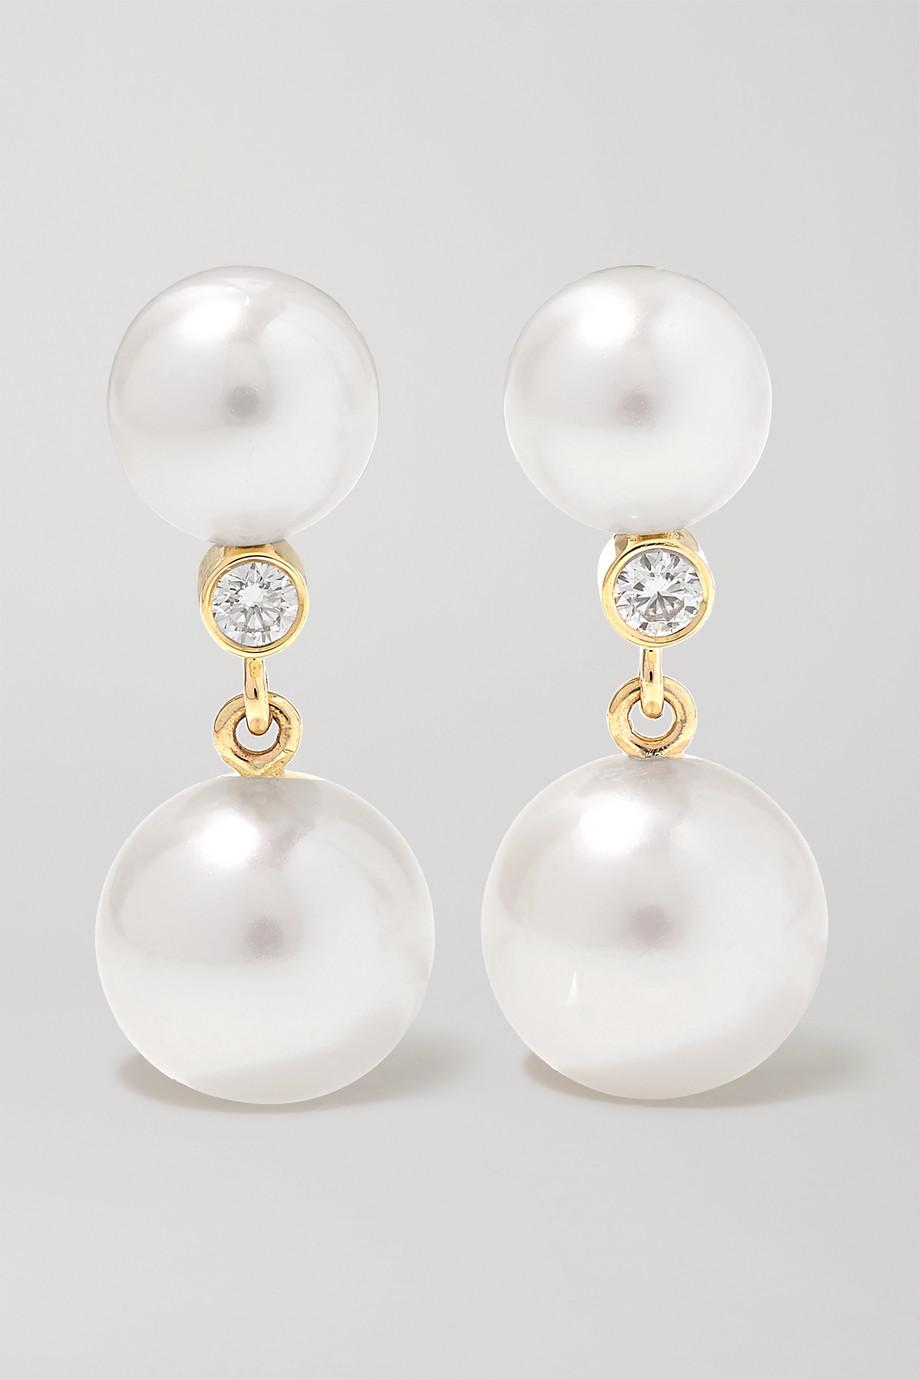 Sophie Bille Brahe Giudecca Diamant 14-karat gold, pearl and diamond earrings